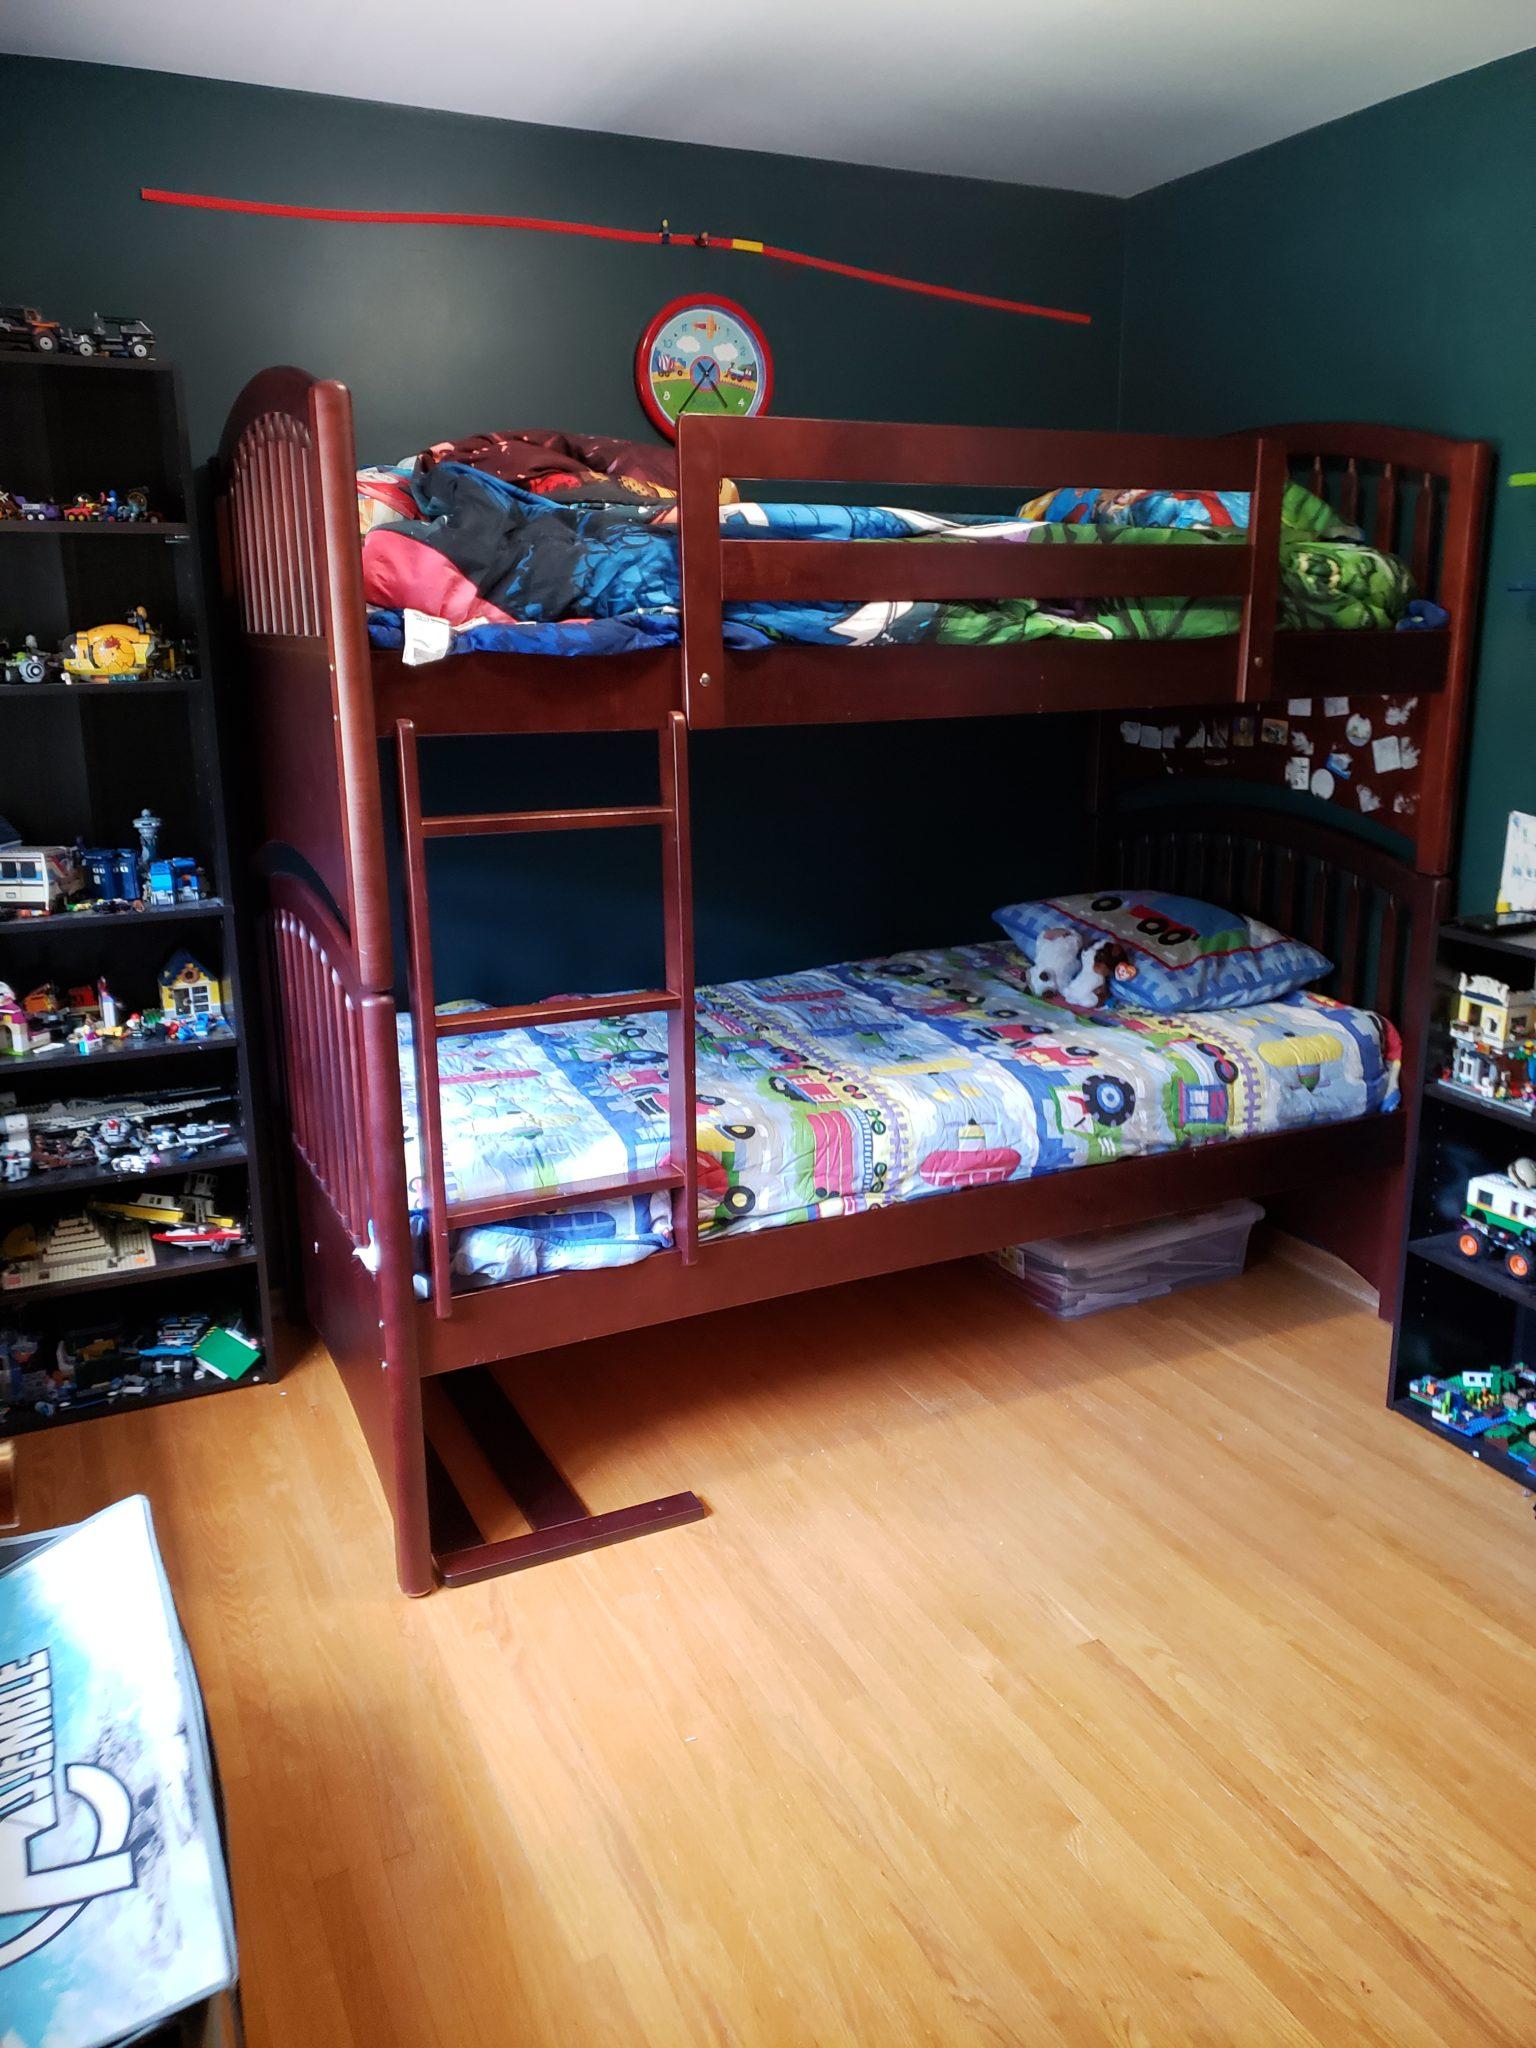 Child's bedroom - After